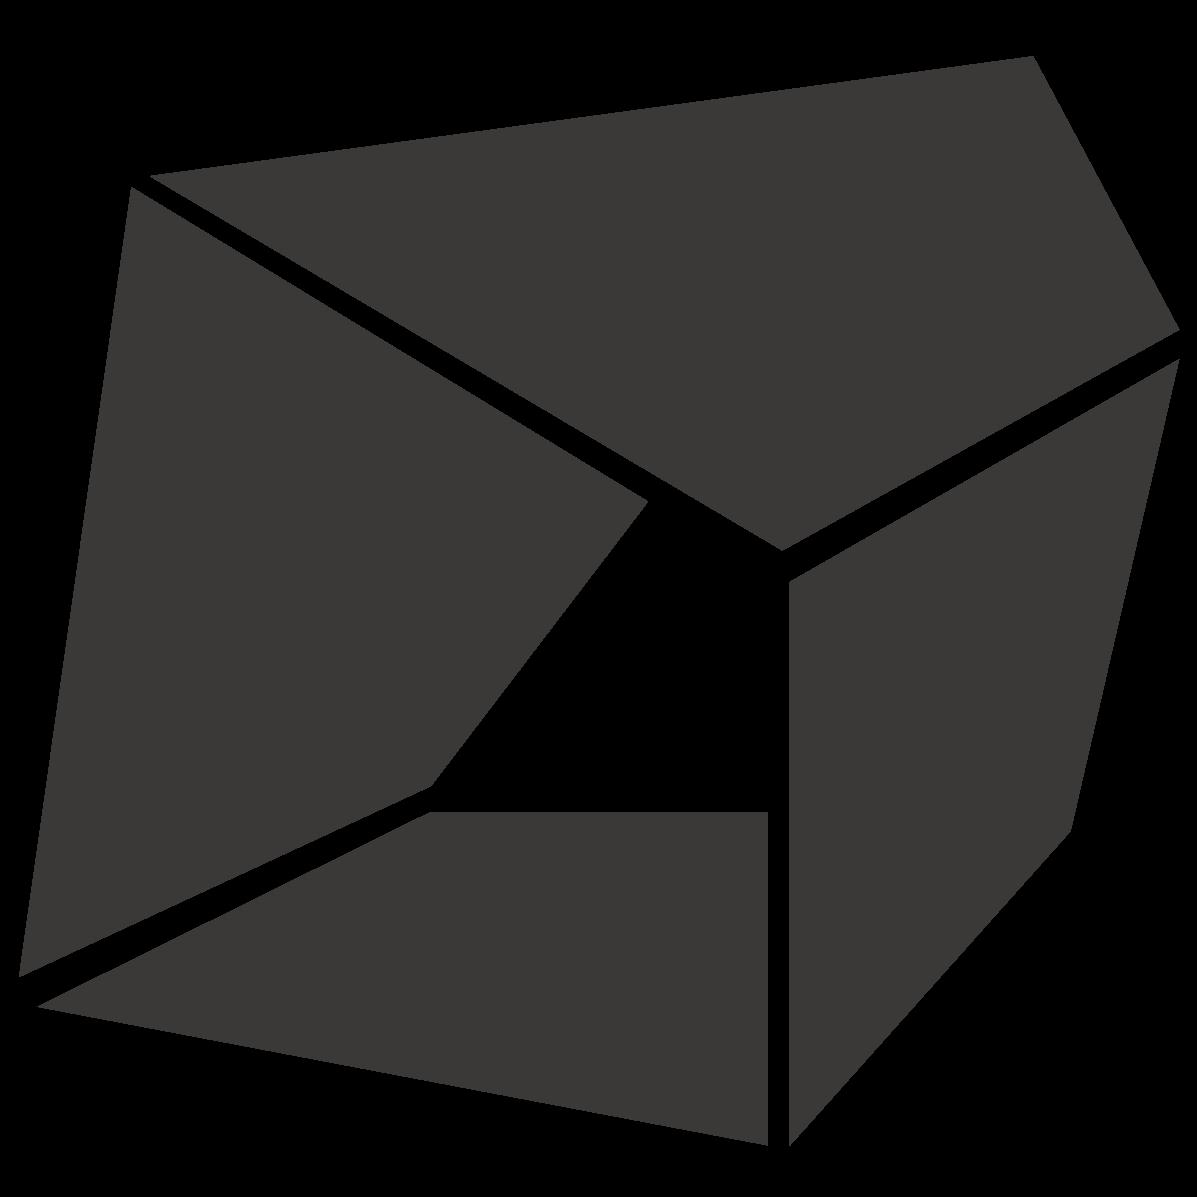 Livetiles sharepoint 1491402983 logo